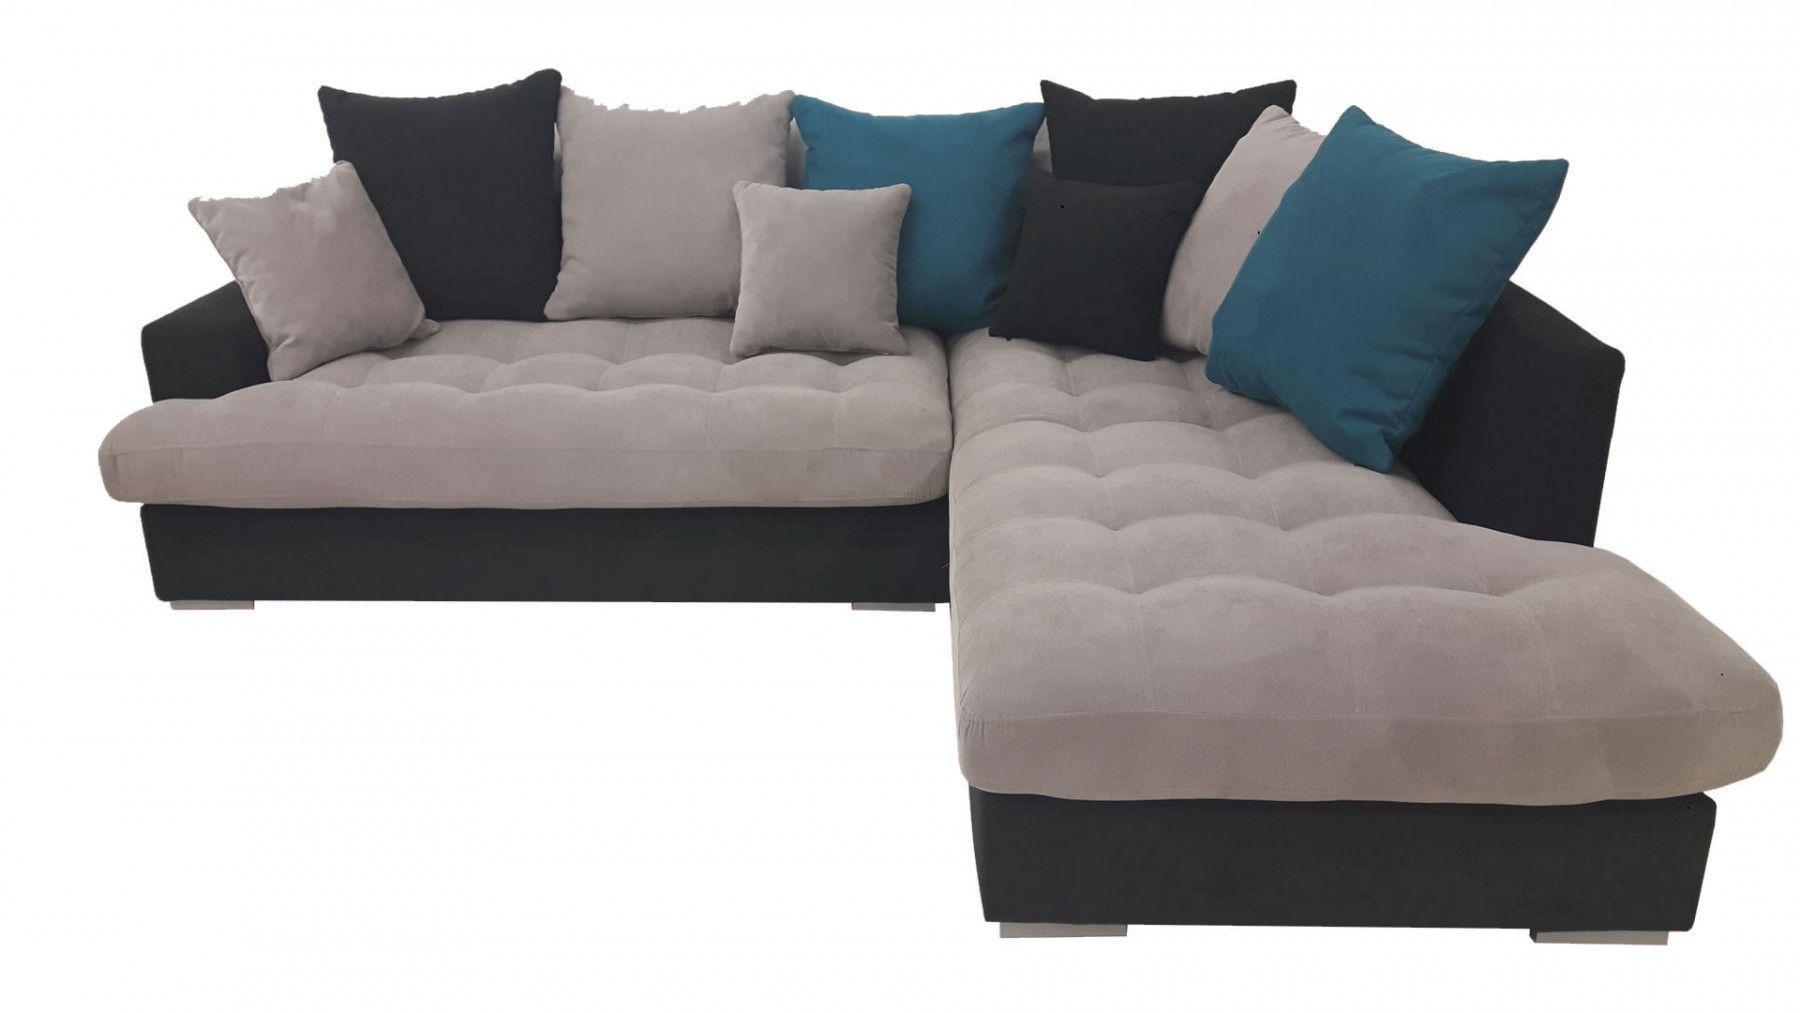 canap s d 39 angle canap d 39 angle droit minda bleu et gris. Black Bedroom Furniture Sets. Home Design Ideas